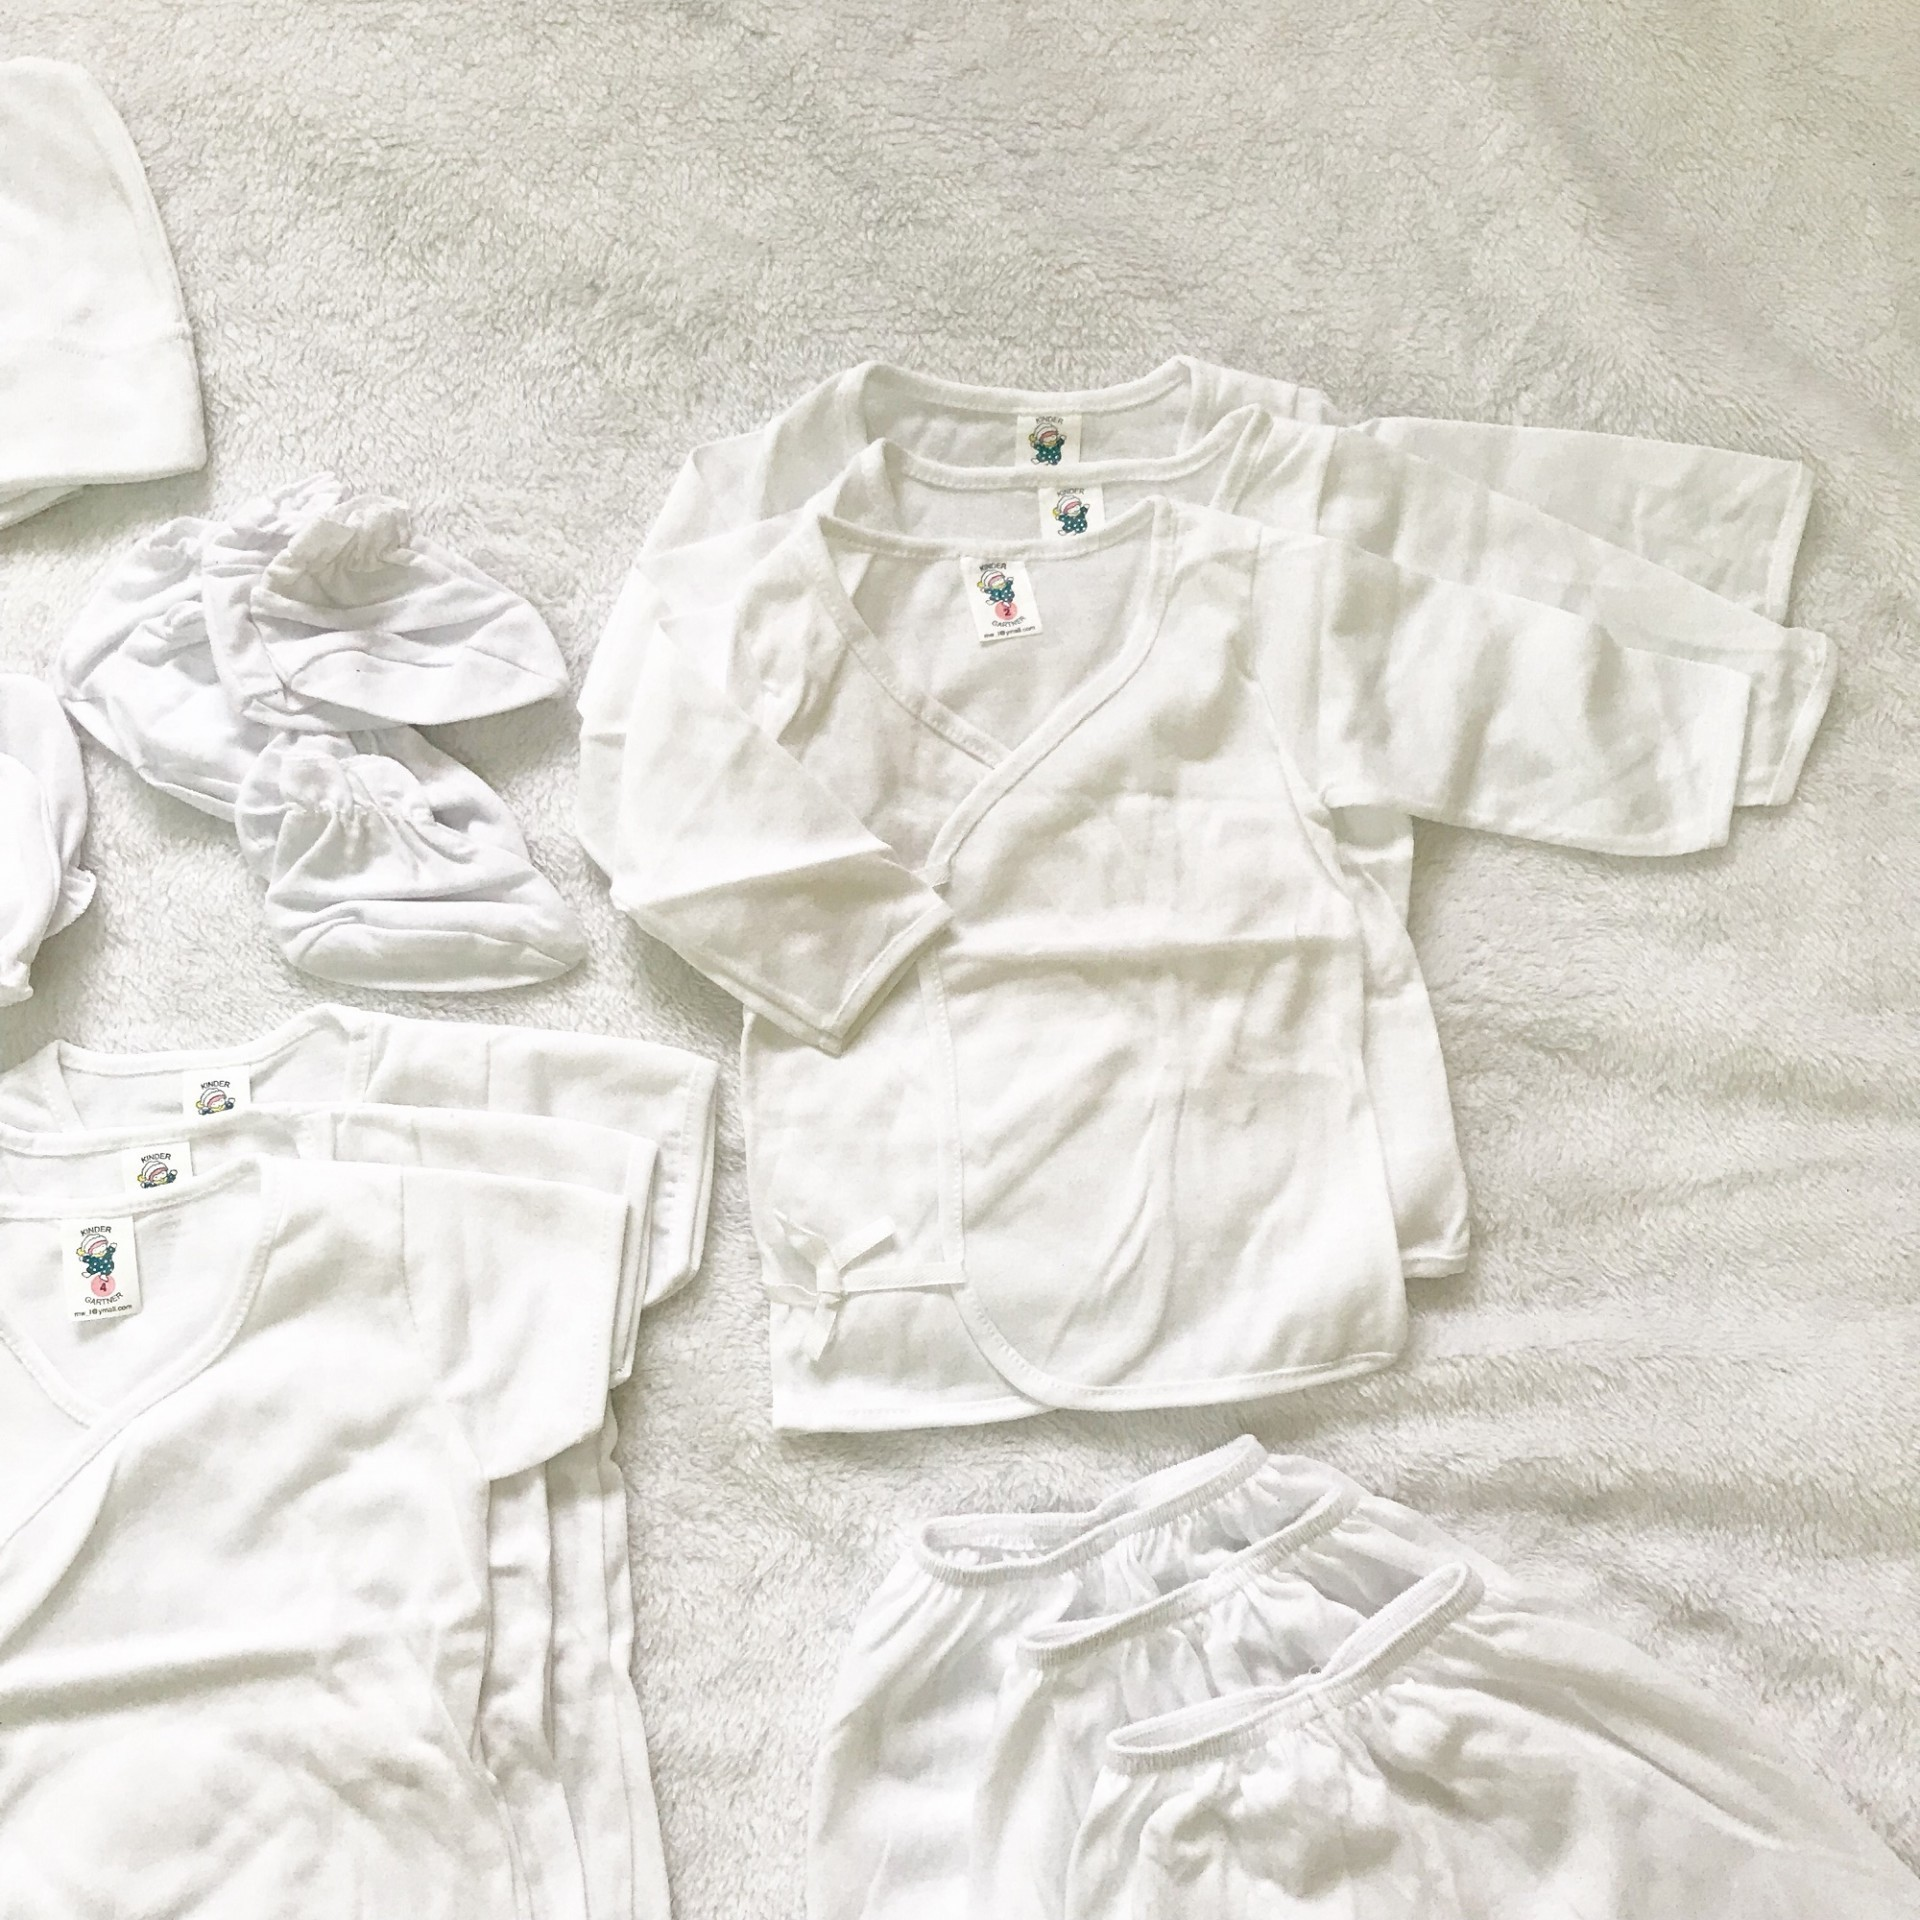 Unisex Baby Stuff I Set Newborn Baby Use (28 Pieces)